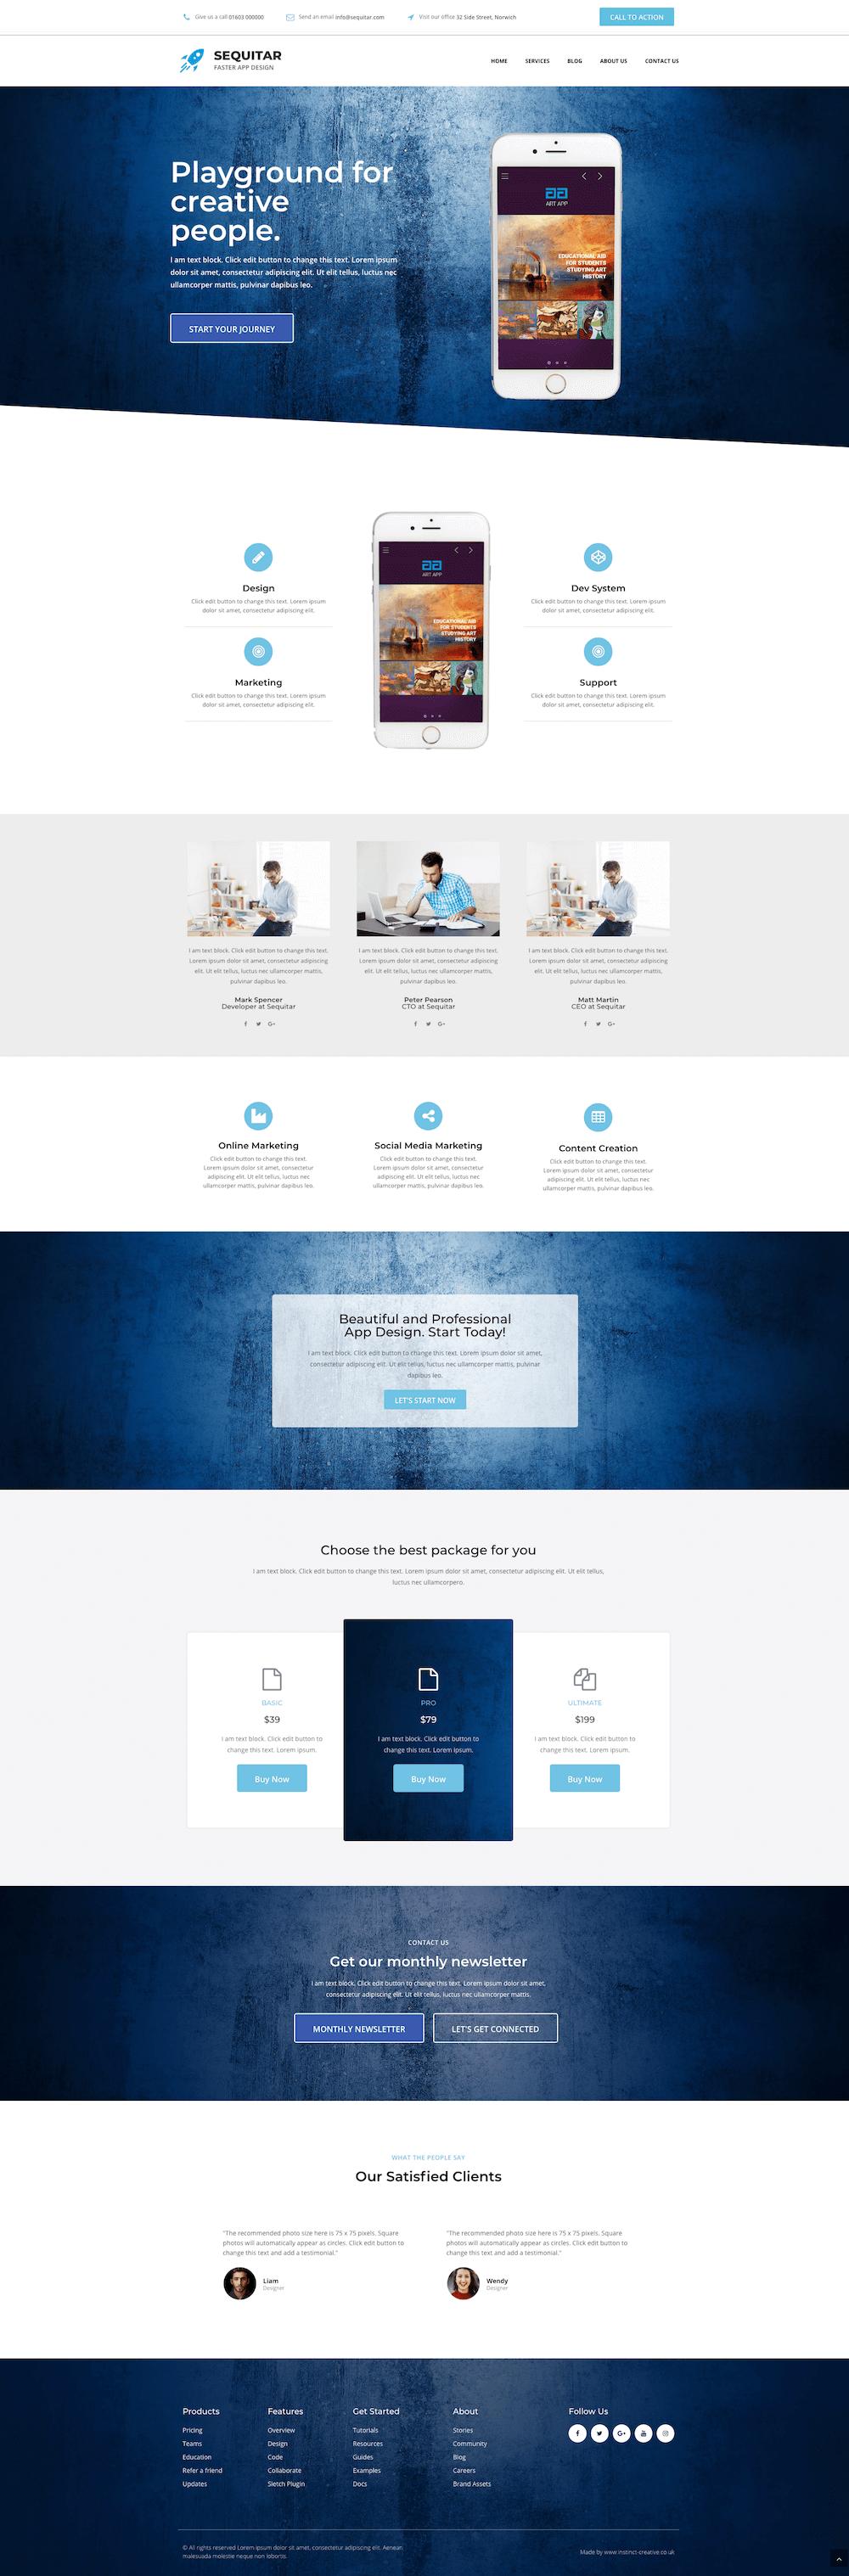 Website Design Template For A City Breaks Business Landing Page Web Design City Design Web Design Inspiration